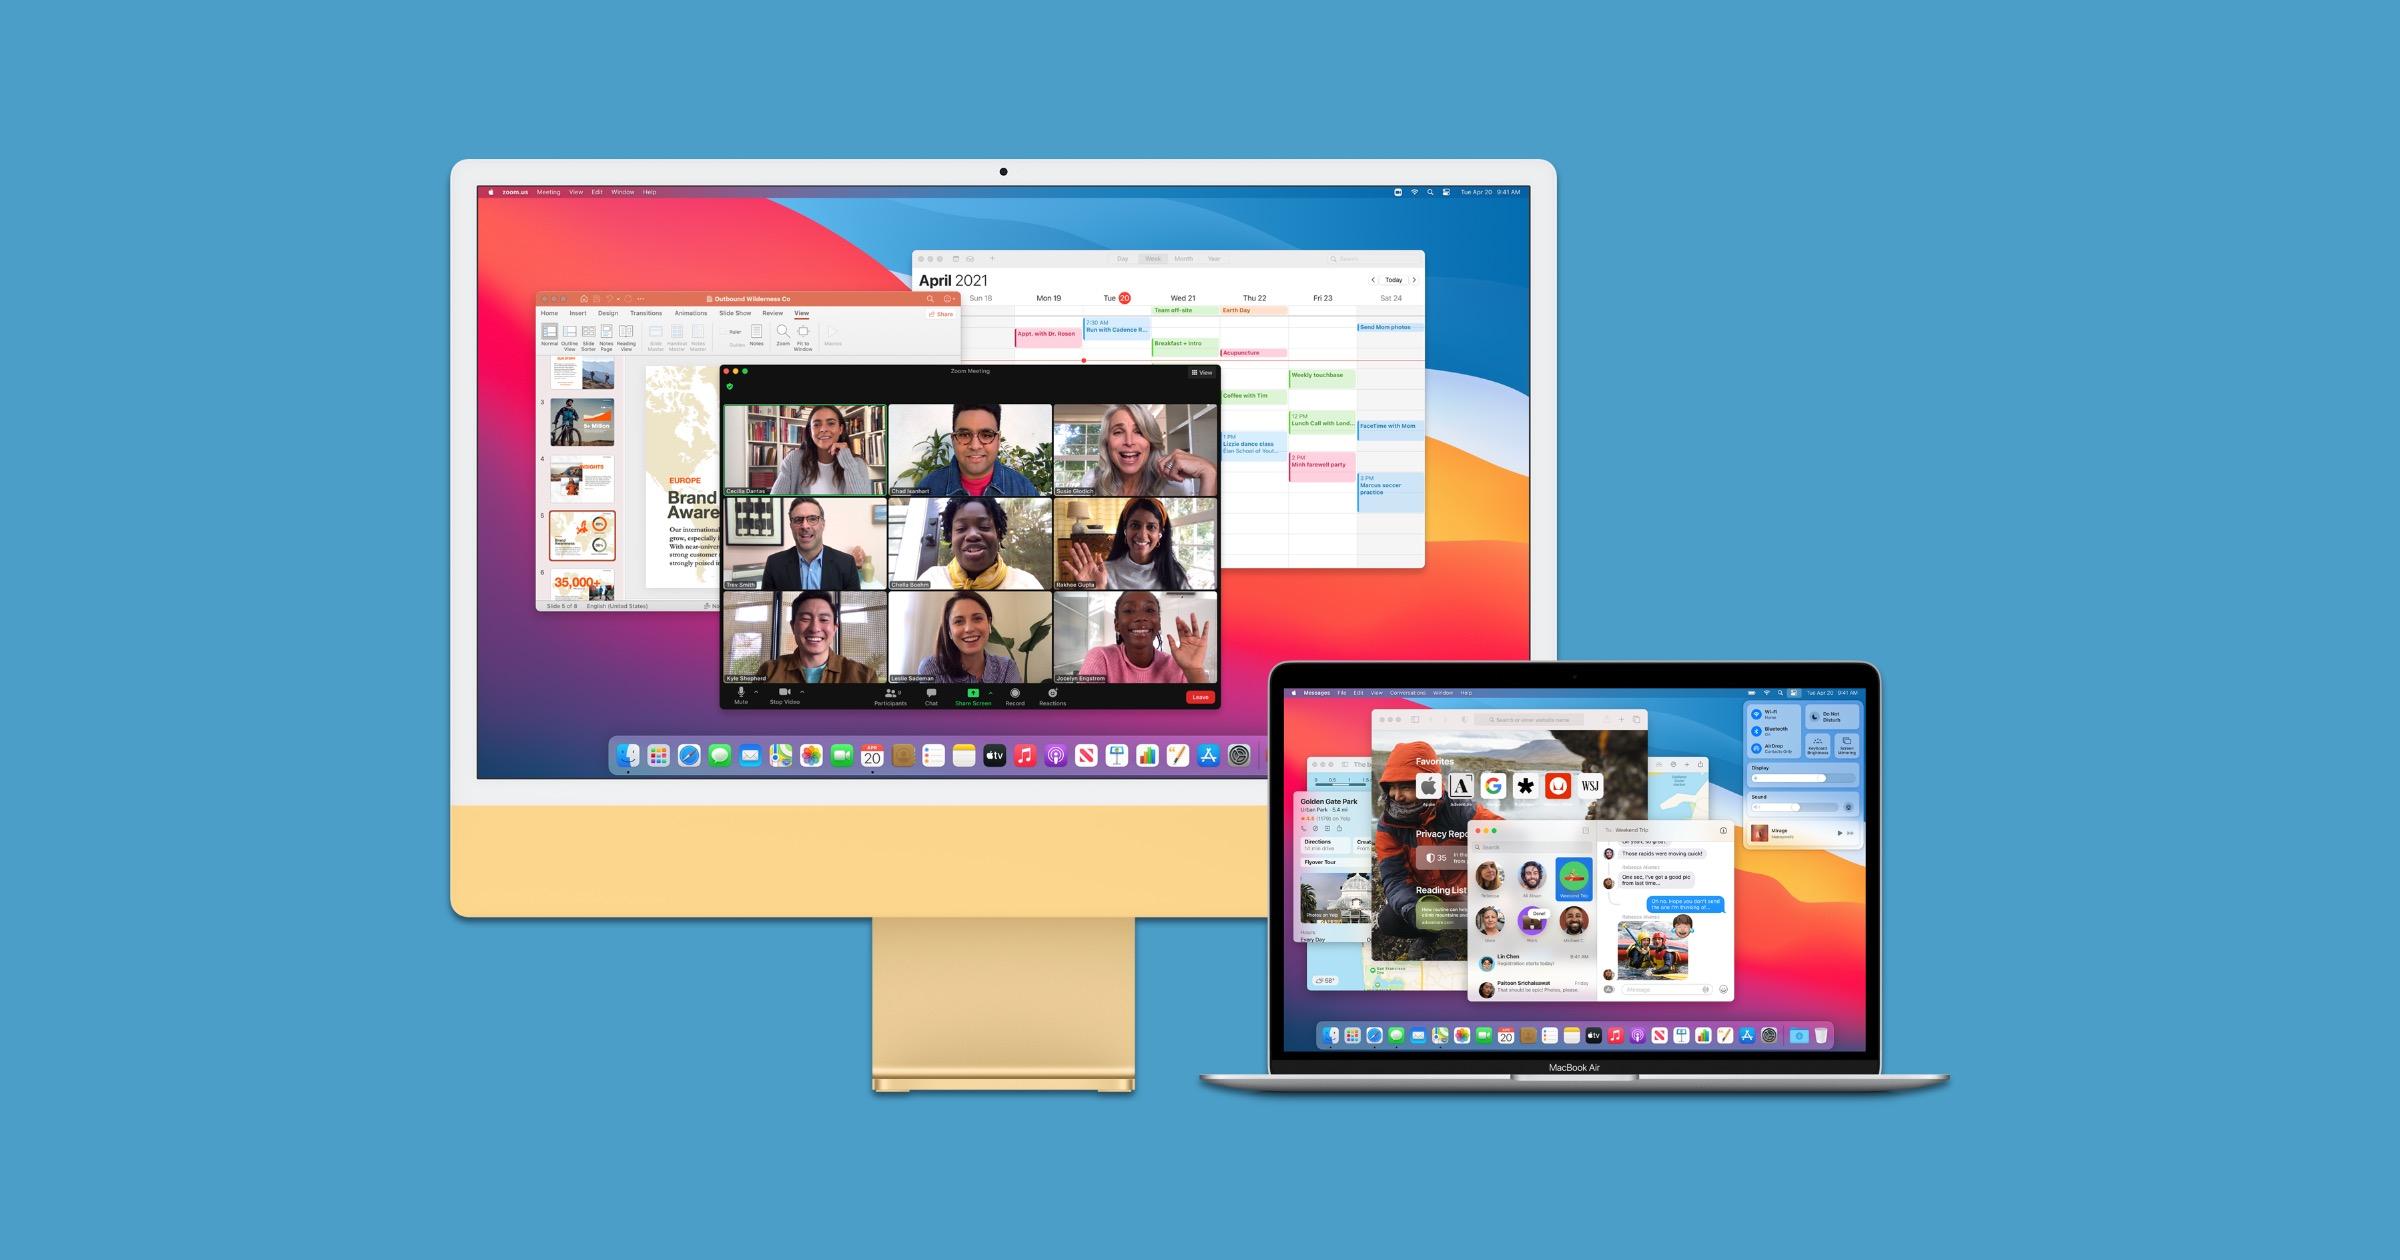 2021 iMac and MacBook Pro